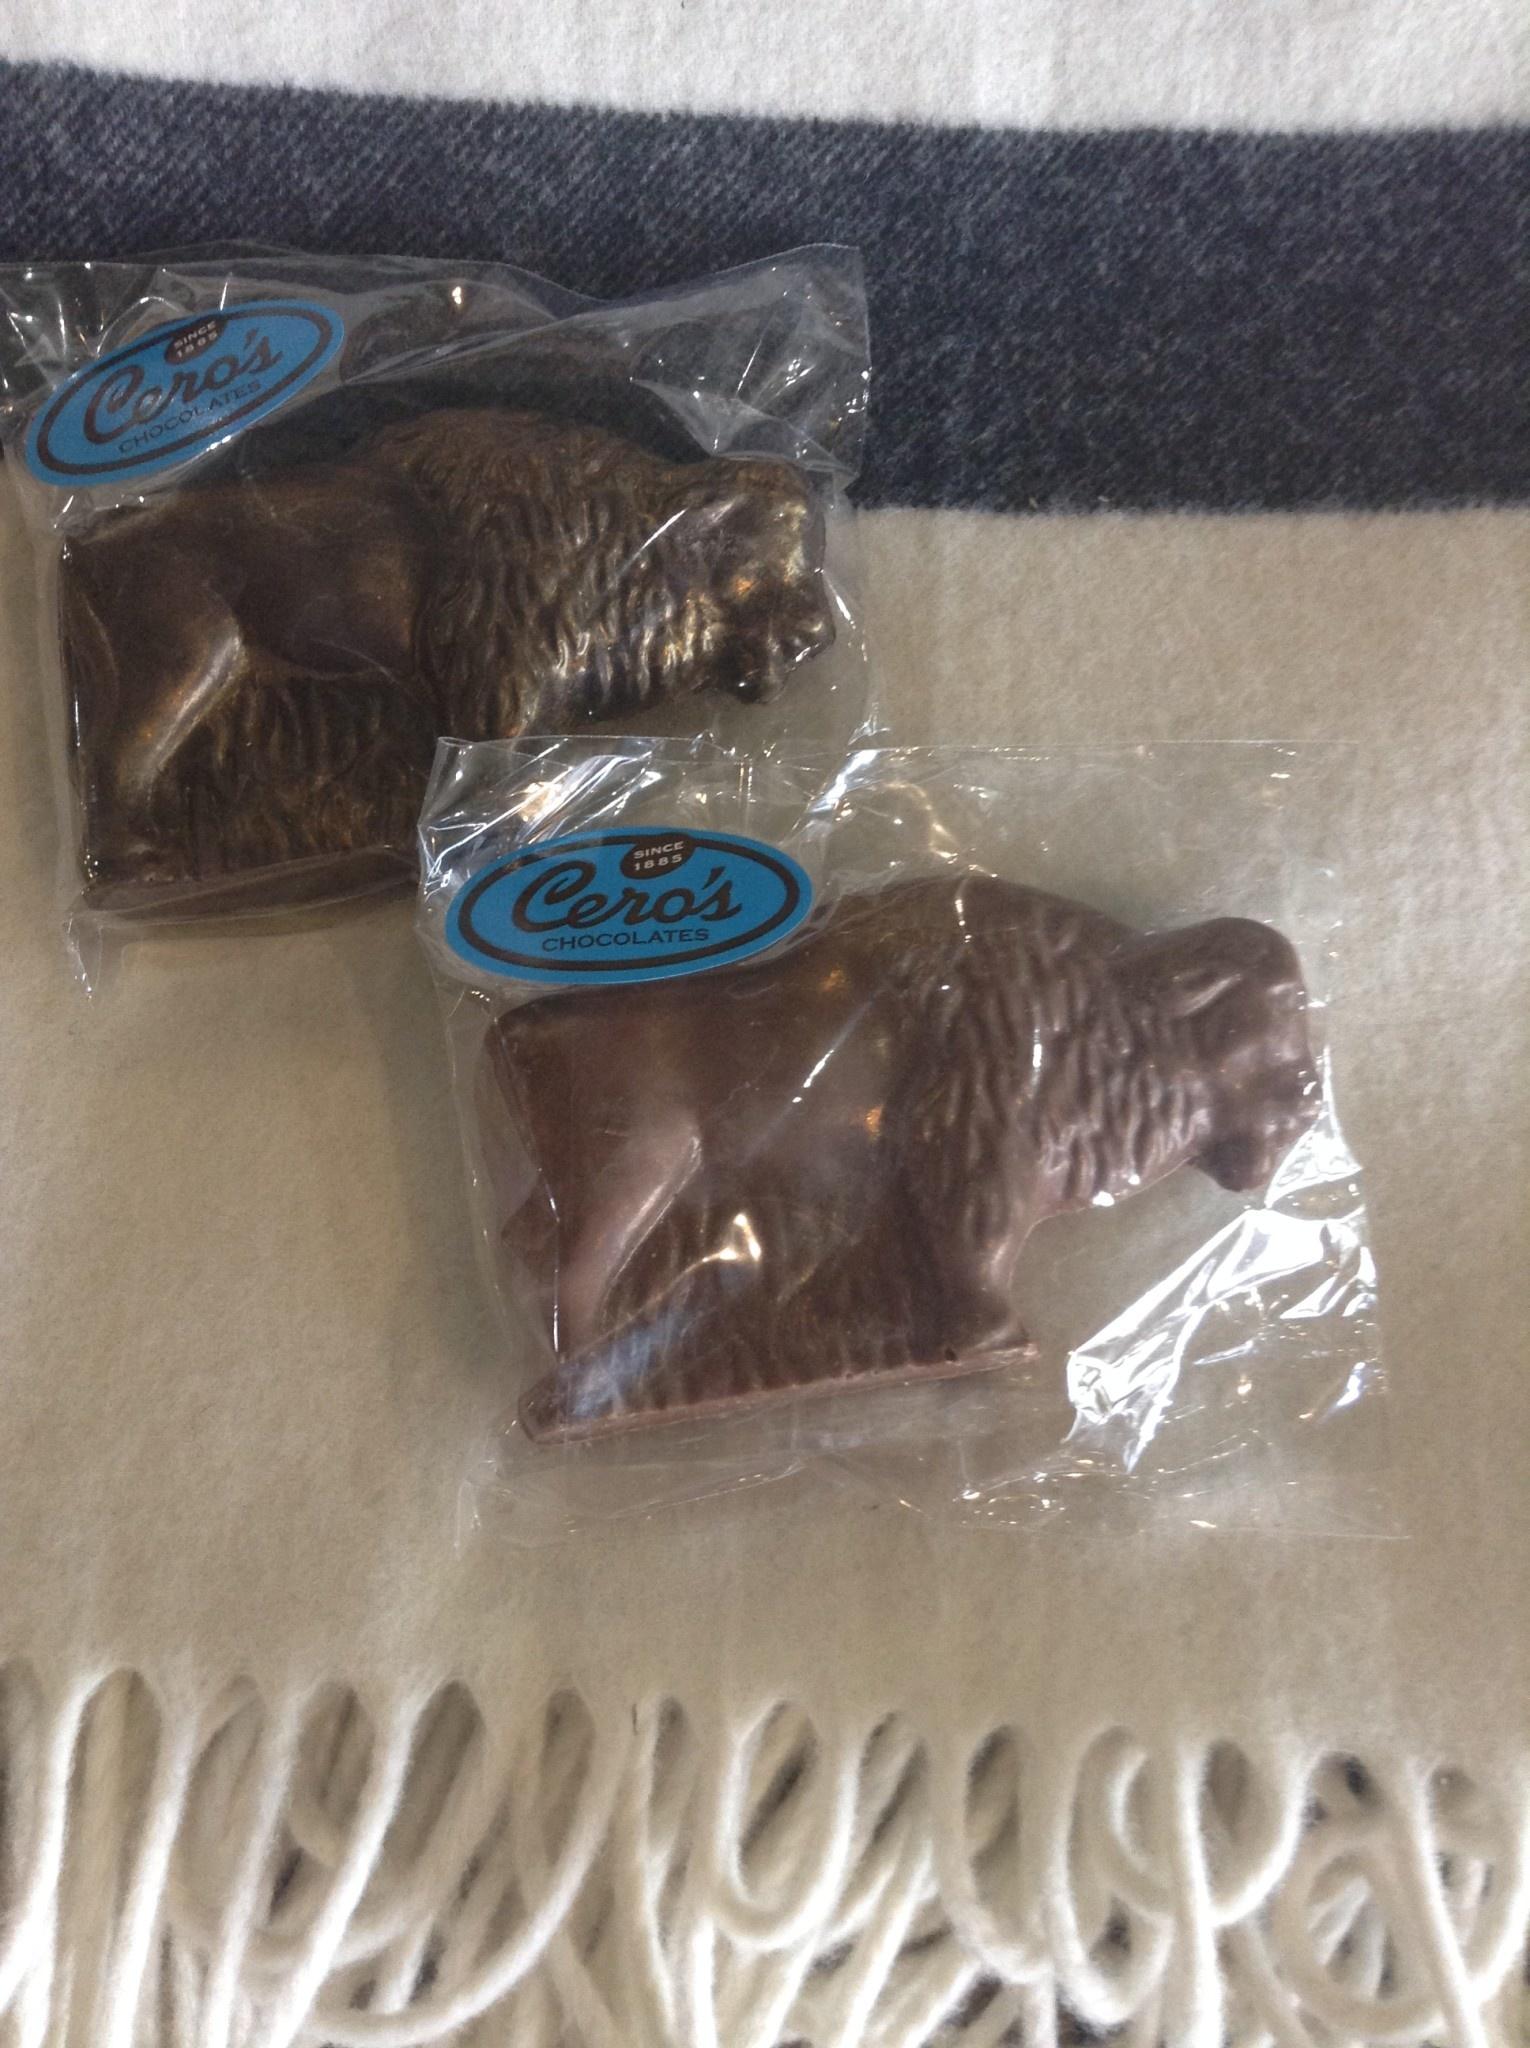 Cero's Candies Dark Chocolate Buffalo